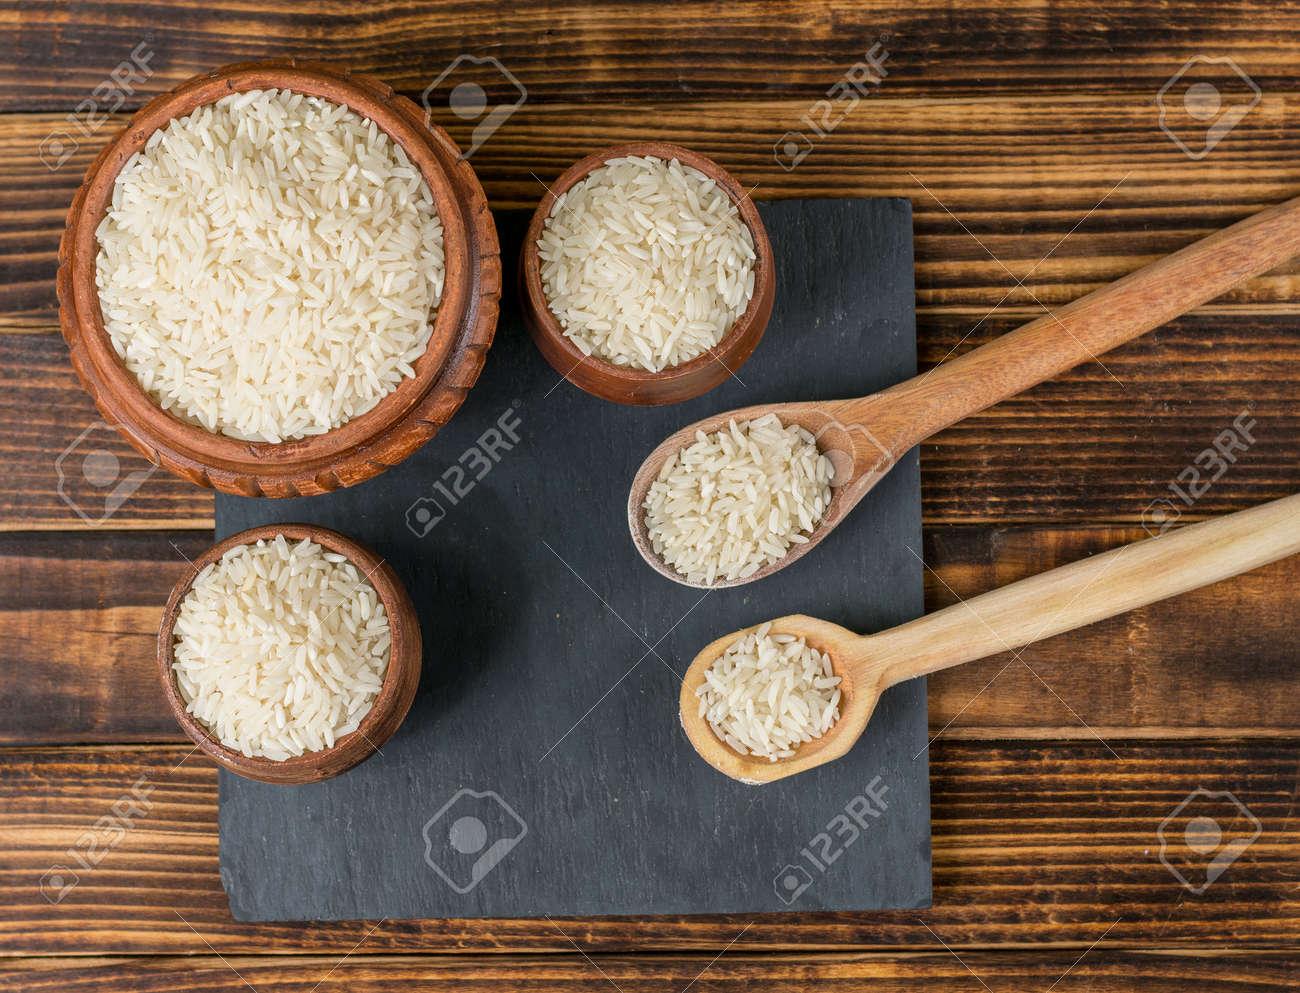 Uncooked rice over kitchen utensils and dark wood - 151833952